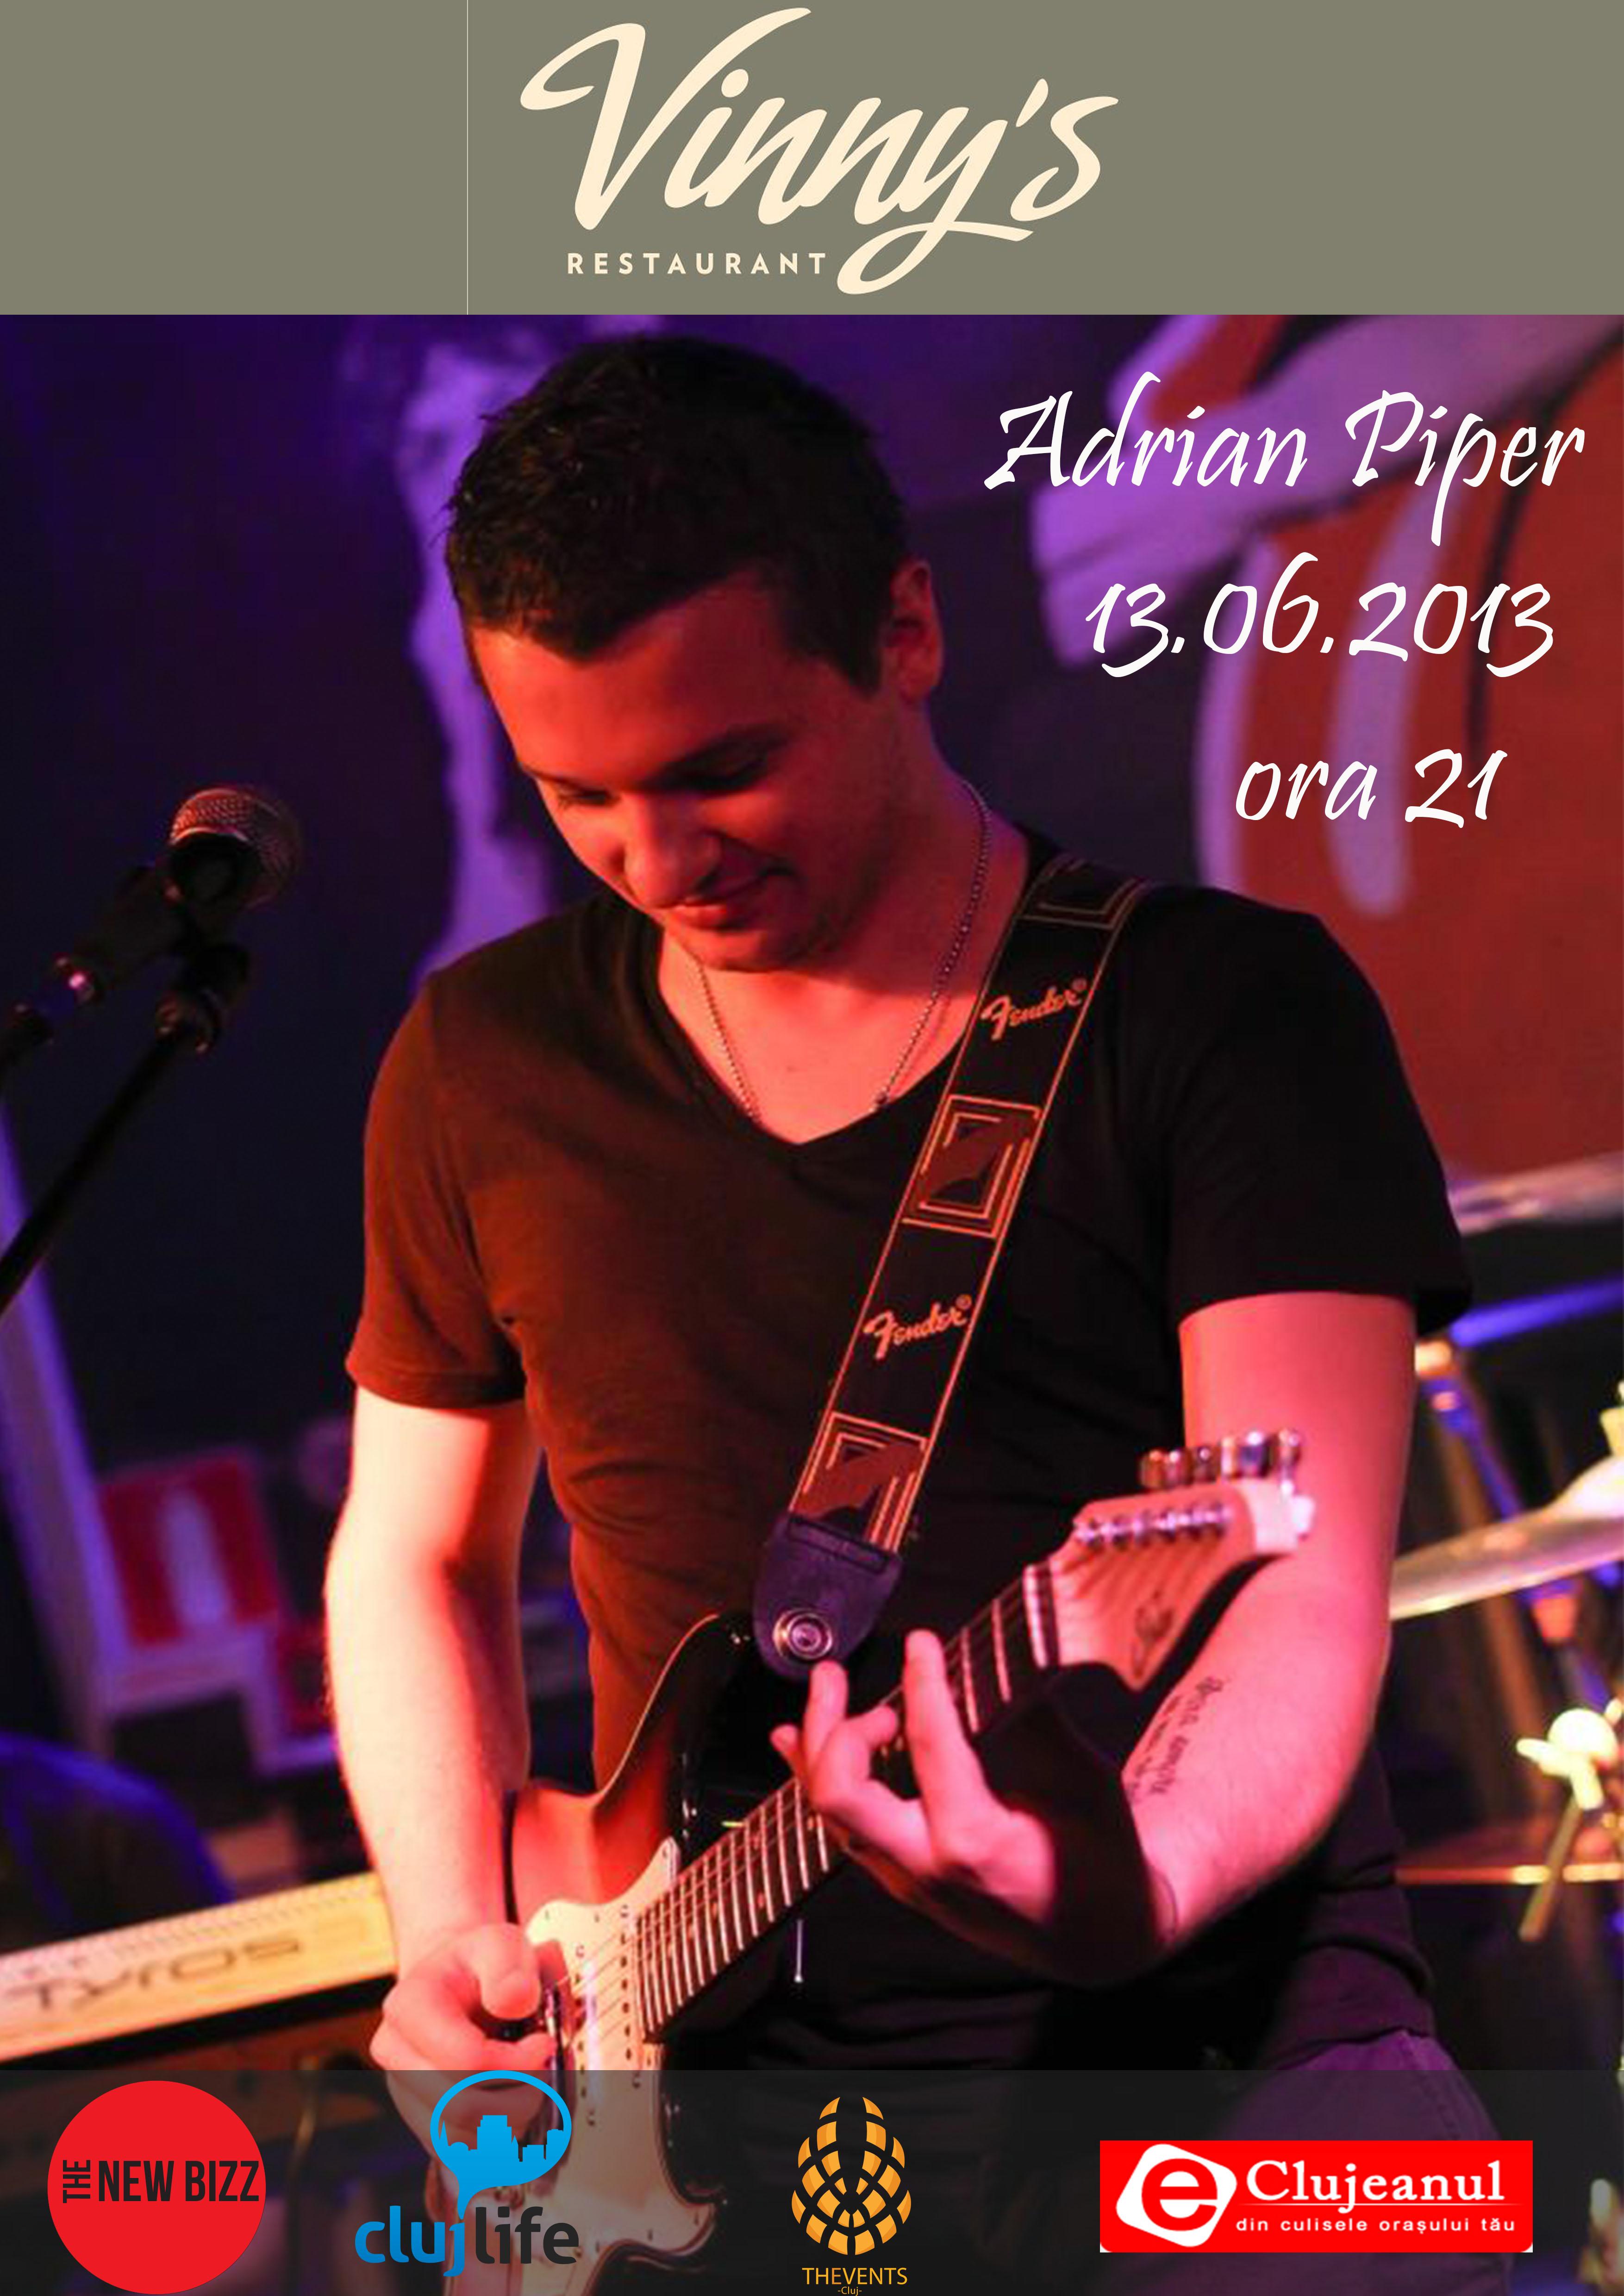 adrian piper @ vinny's